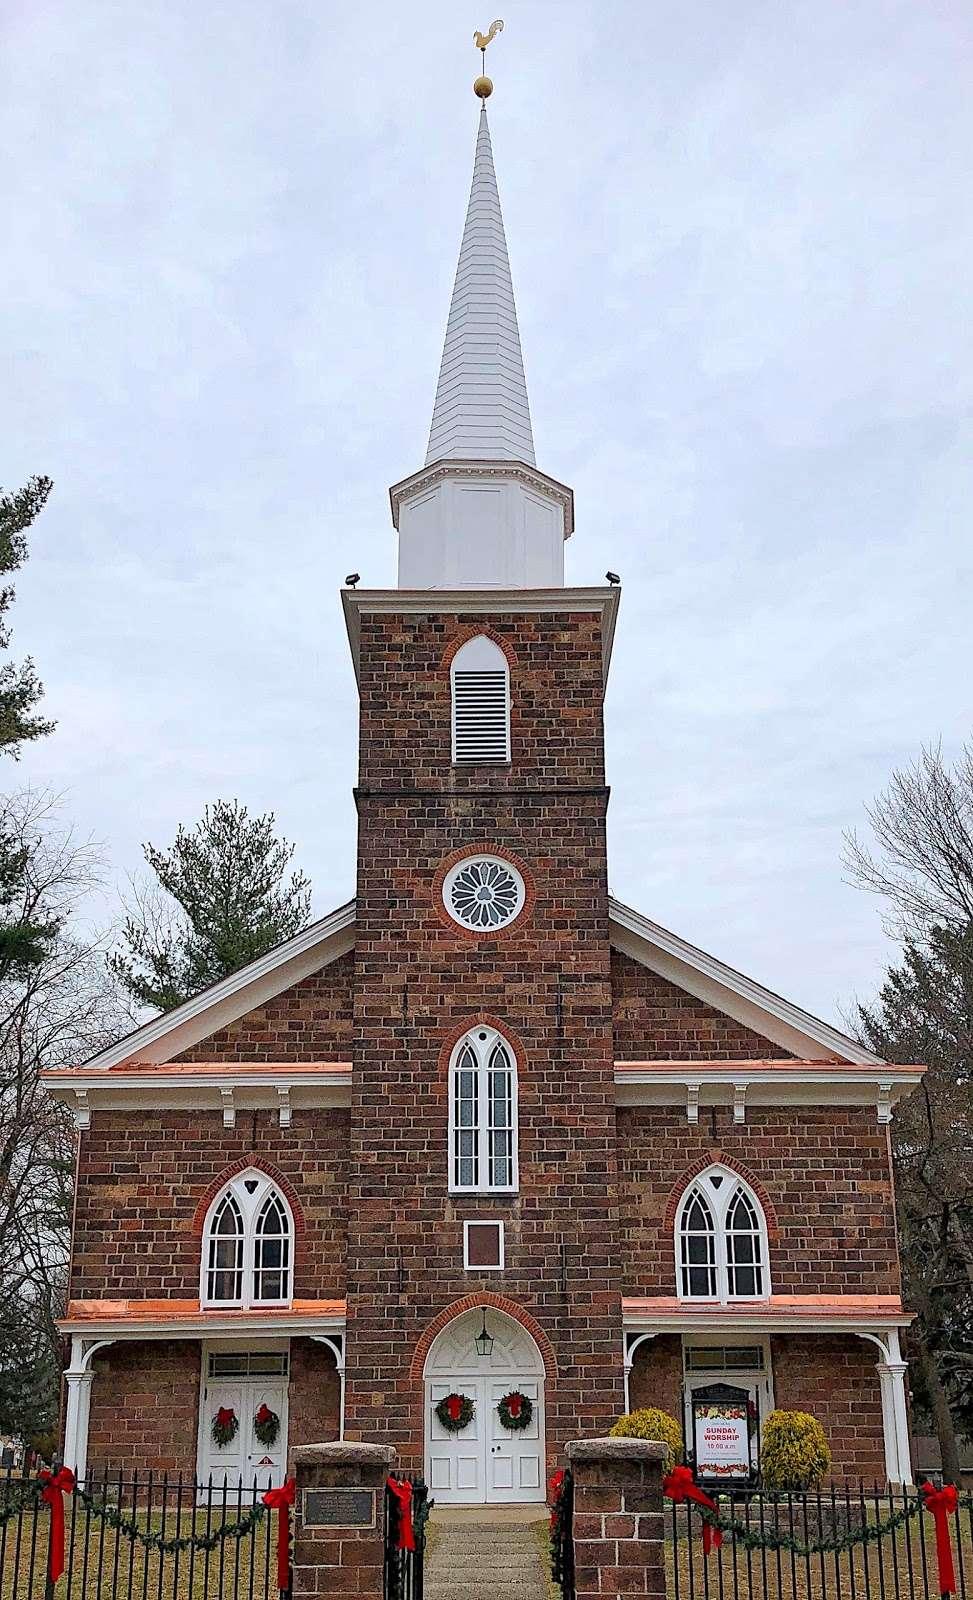 South Presbyterian Church - church  | Photo 4 of 10 | Address: 150 W Church St, Bergenfield, NJ 07621, USA | Phone: (201) 384-8932